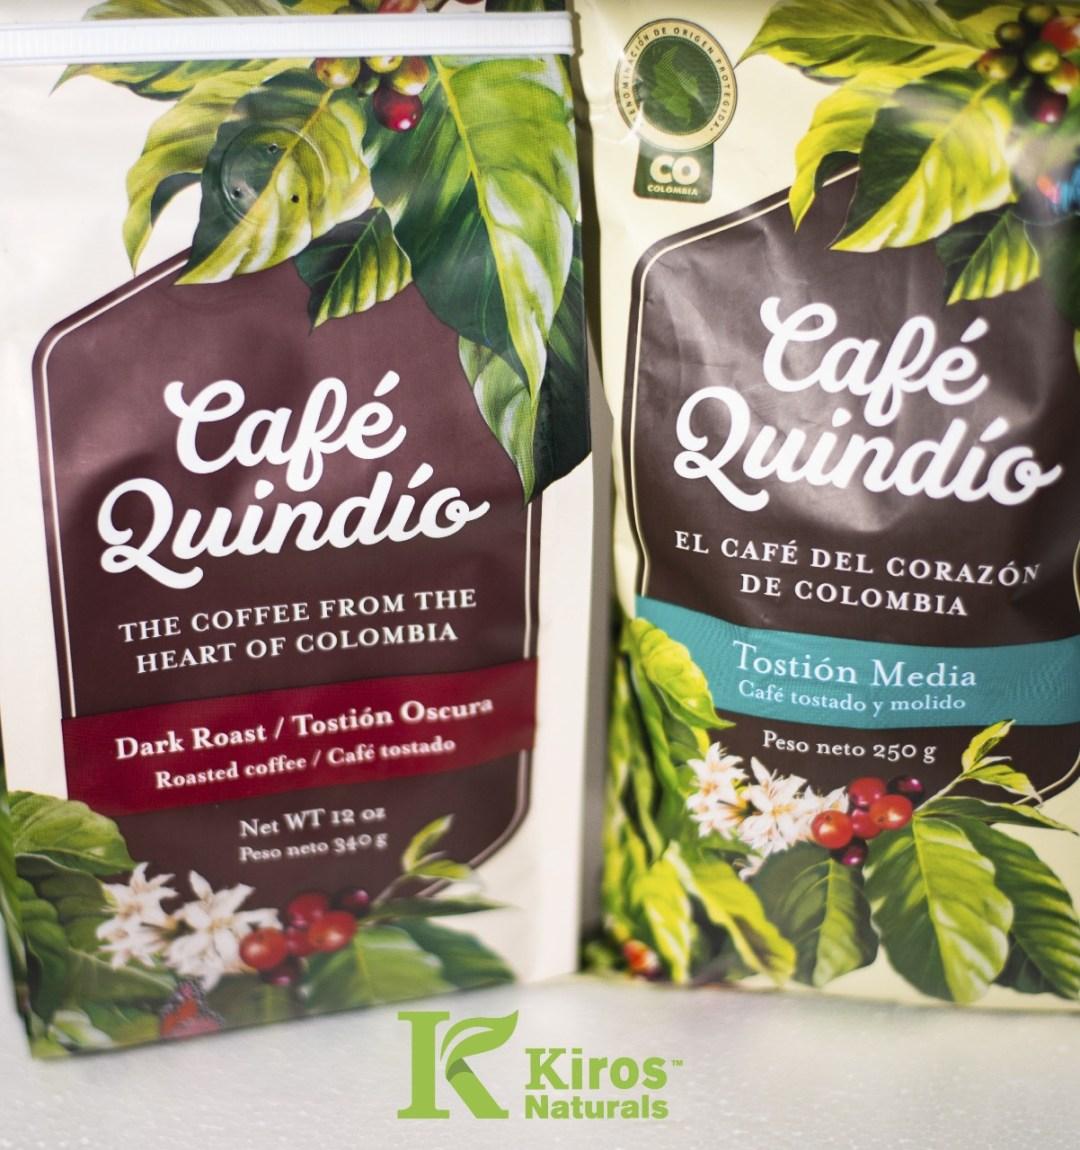 free-café-quindio-sample